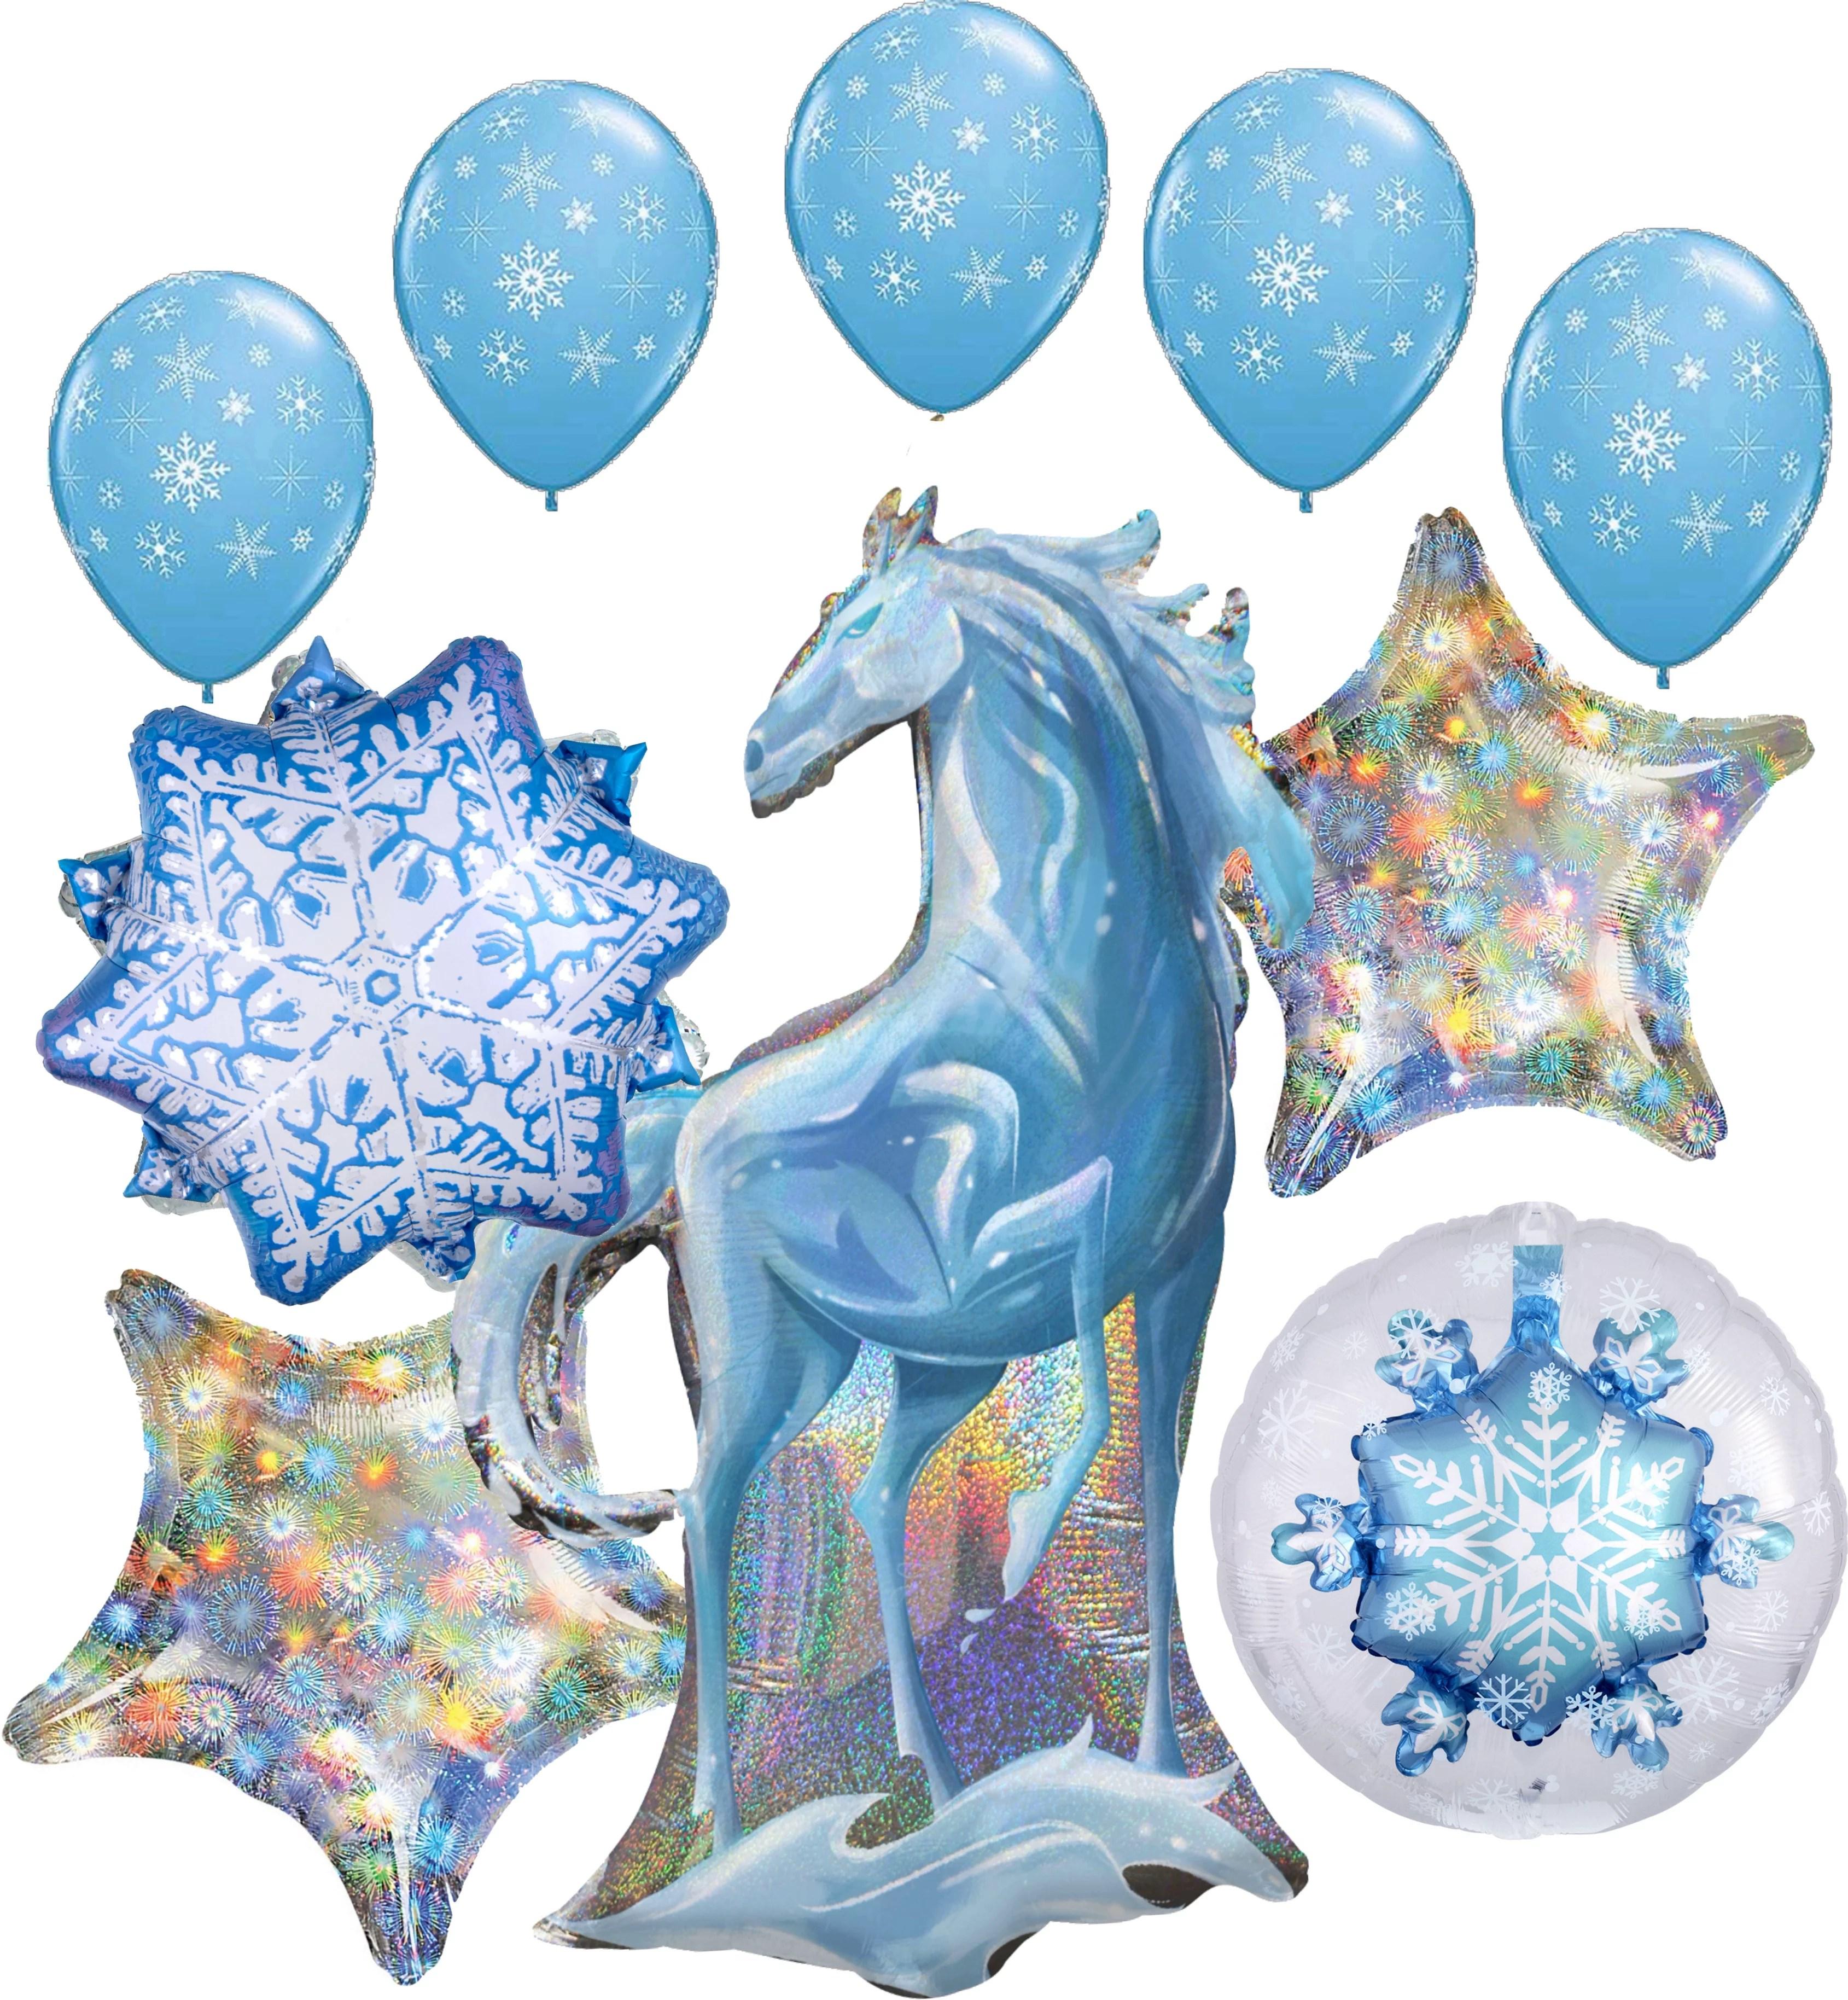 Frozen 2 Party Supplies Nokk The Water Spirit Balloon Bouquet Decorations Walmart Com Walmart Com